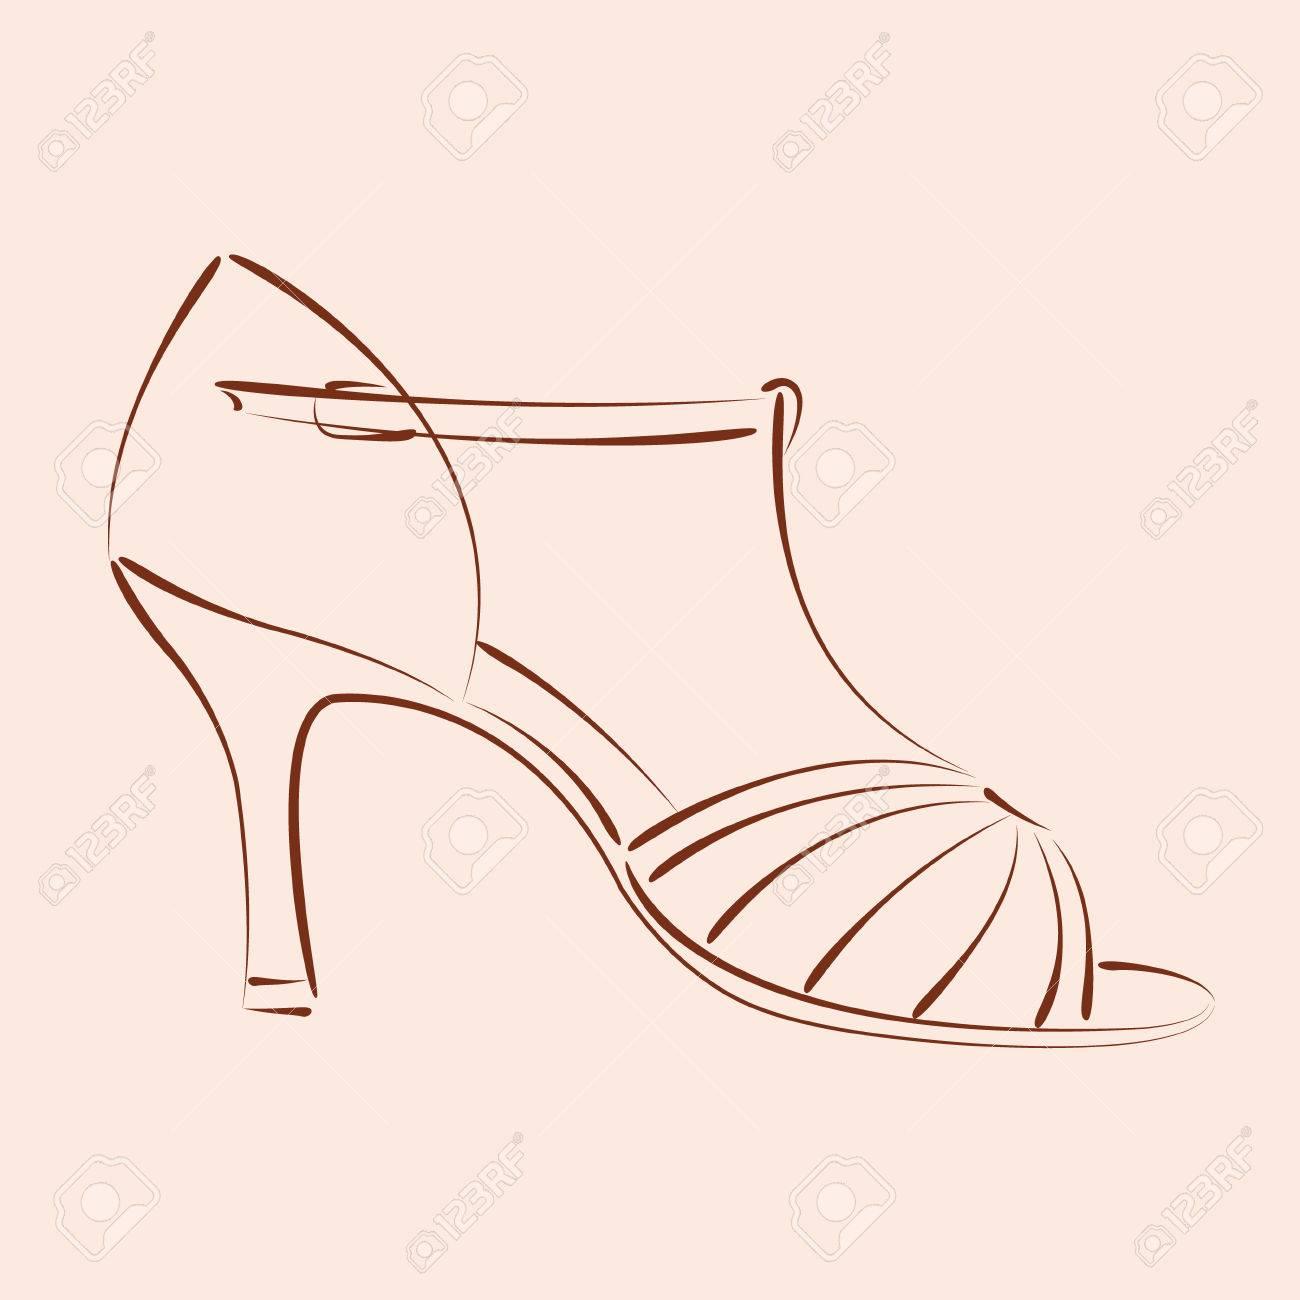 1300x1300 Elegant Sketched Woman S Shoe. Salsa Dance Shoes. Background